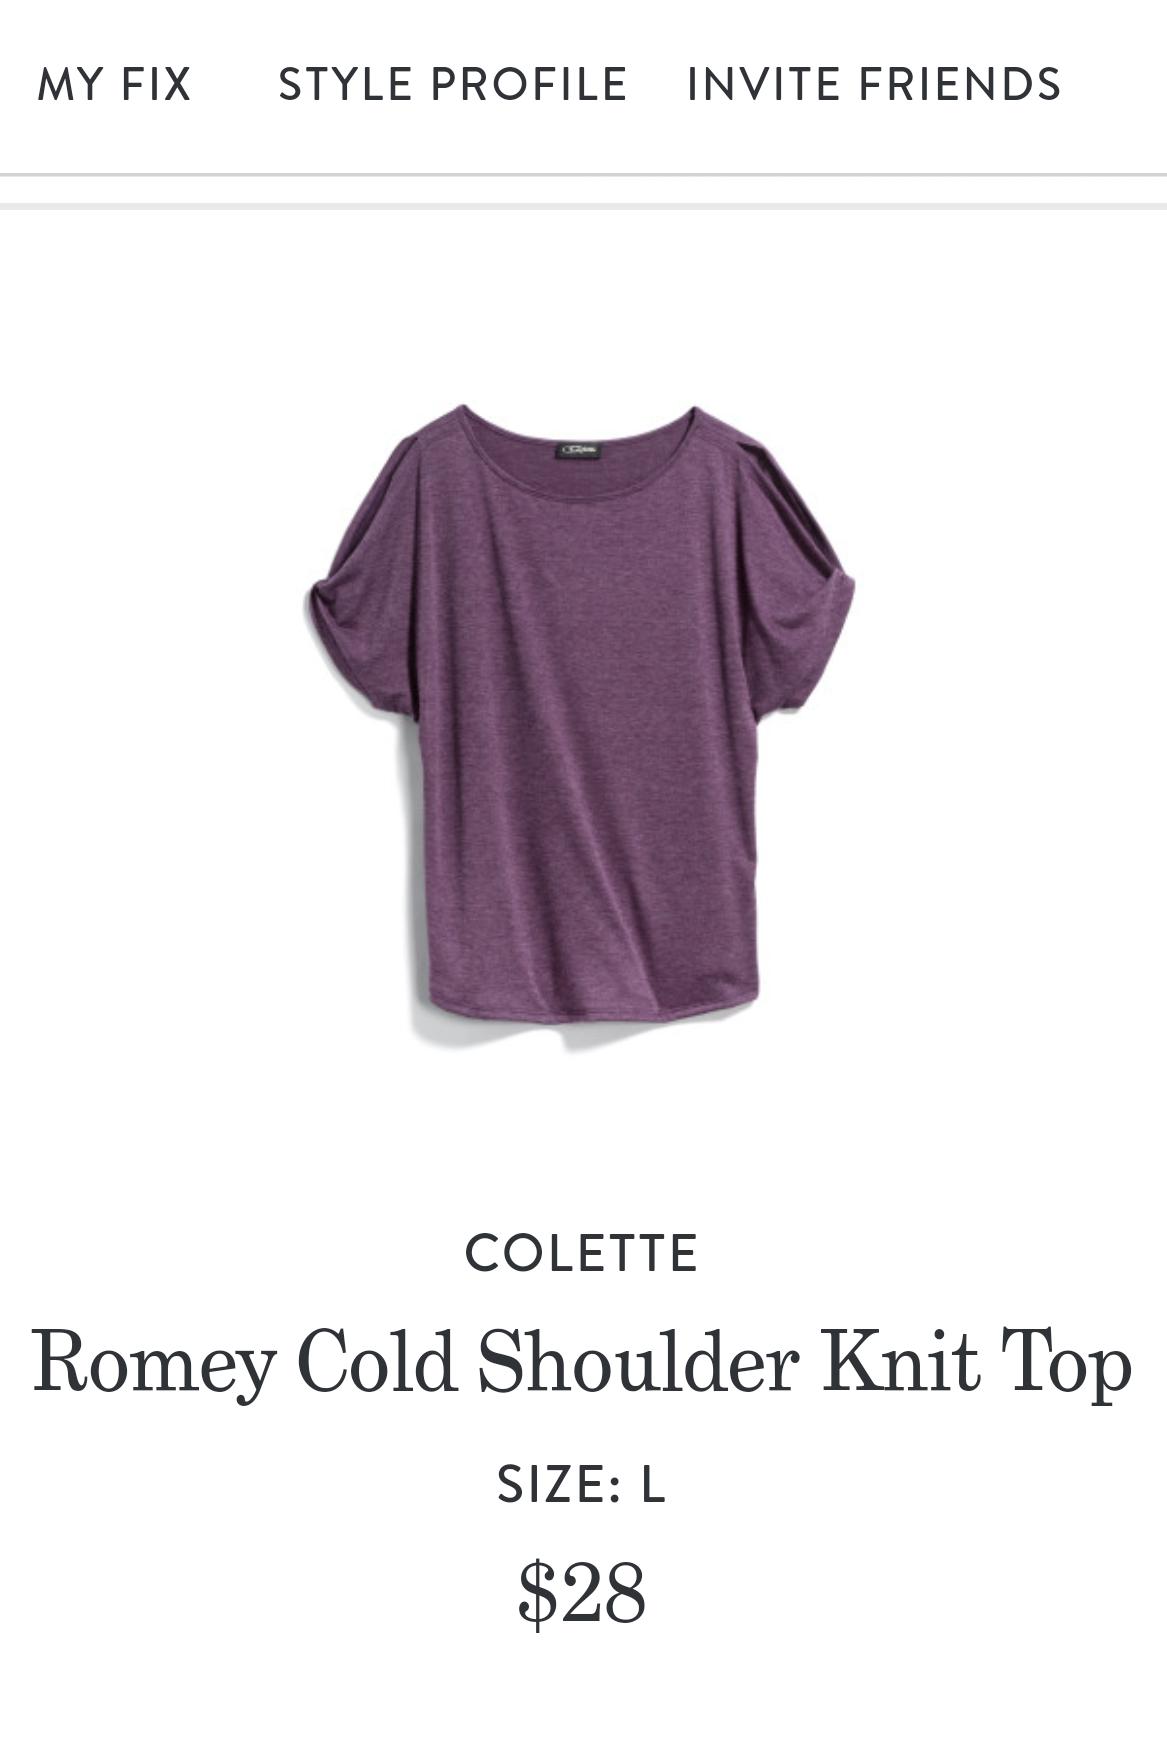 Colette Romey Cold Shoulder Knit Top